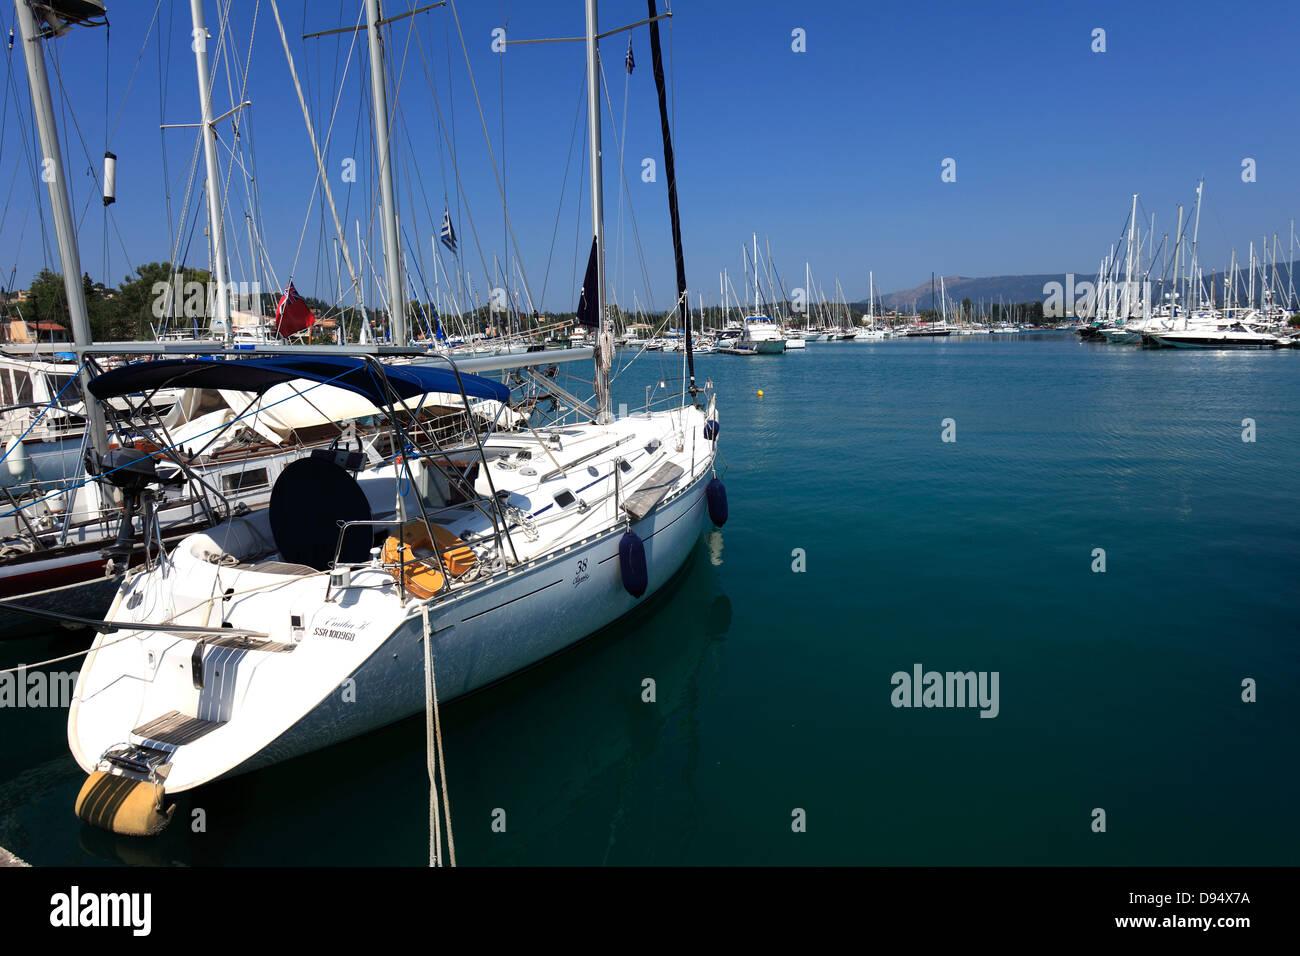 View of Sailing boats, Gouvia Marina, Gouvia resort, Corfu Island, Greece, Europe - Stock Image